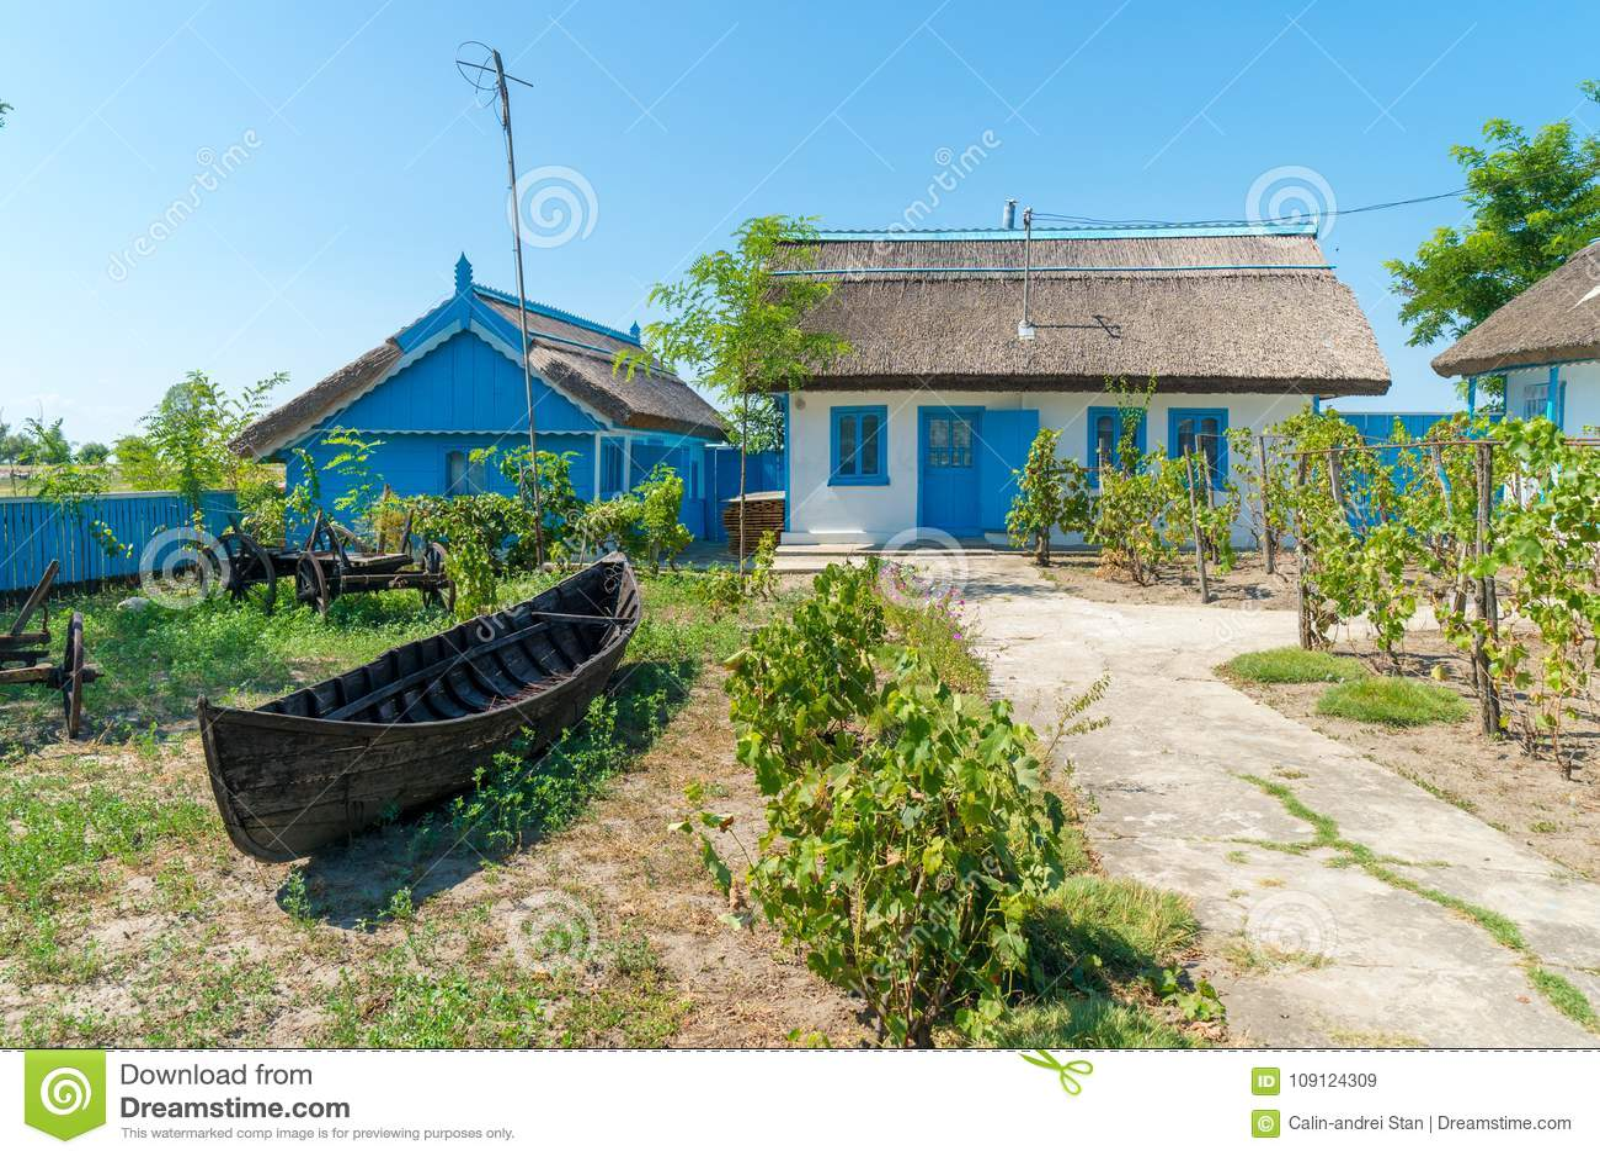 Letea, Danube Delta, Romania, August 2017: Traditional House in